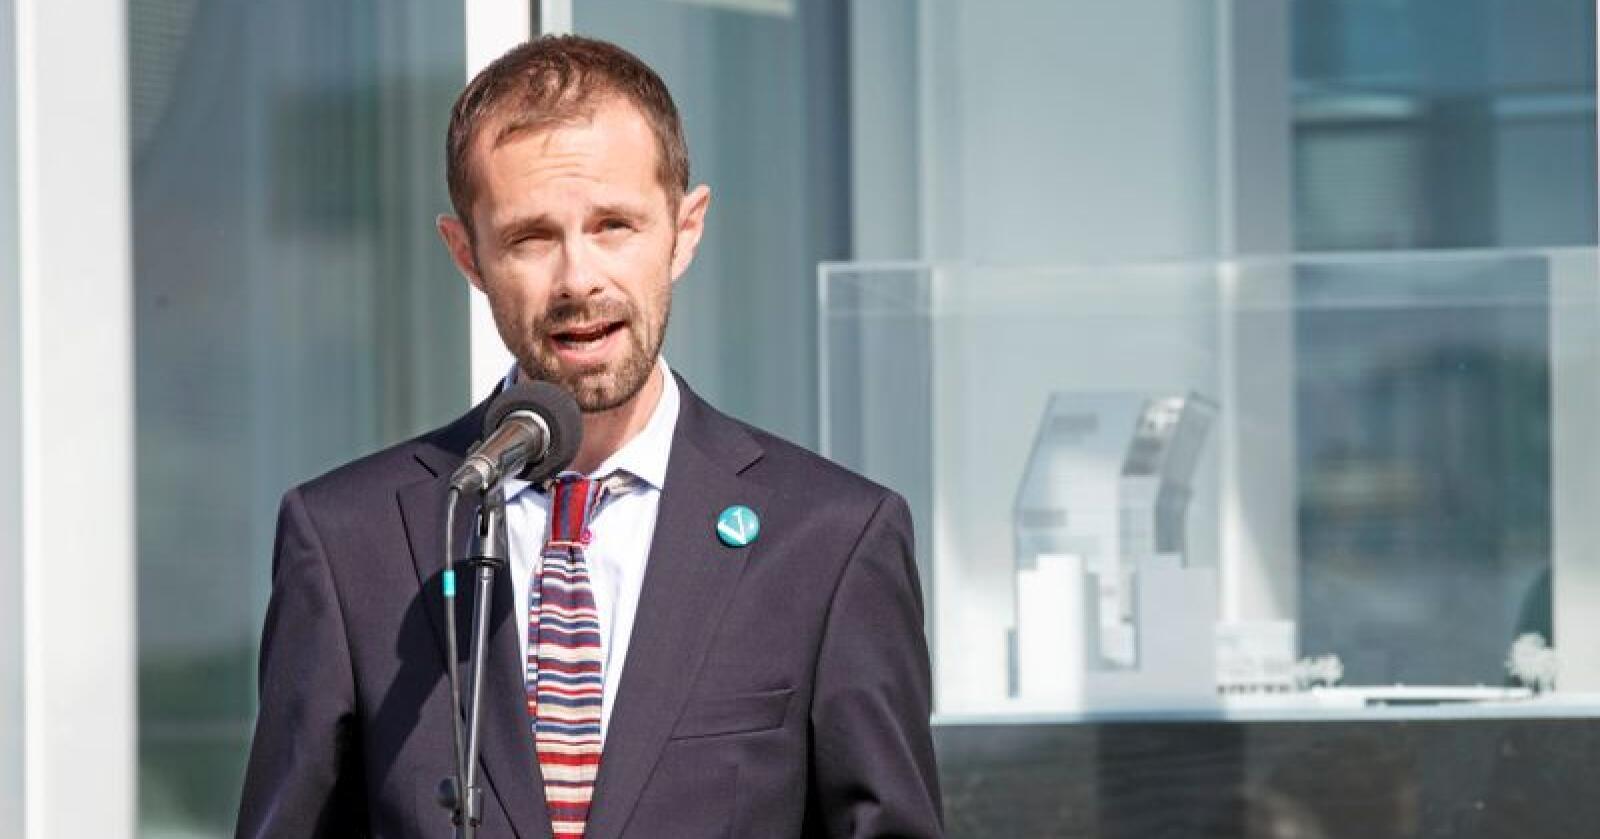 Hallstein Bjercke (V) har vært kulturbyråd i Oslo. Foto: Gorm Kallestad / NTB scanpix